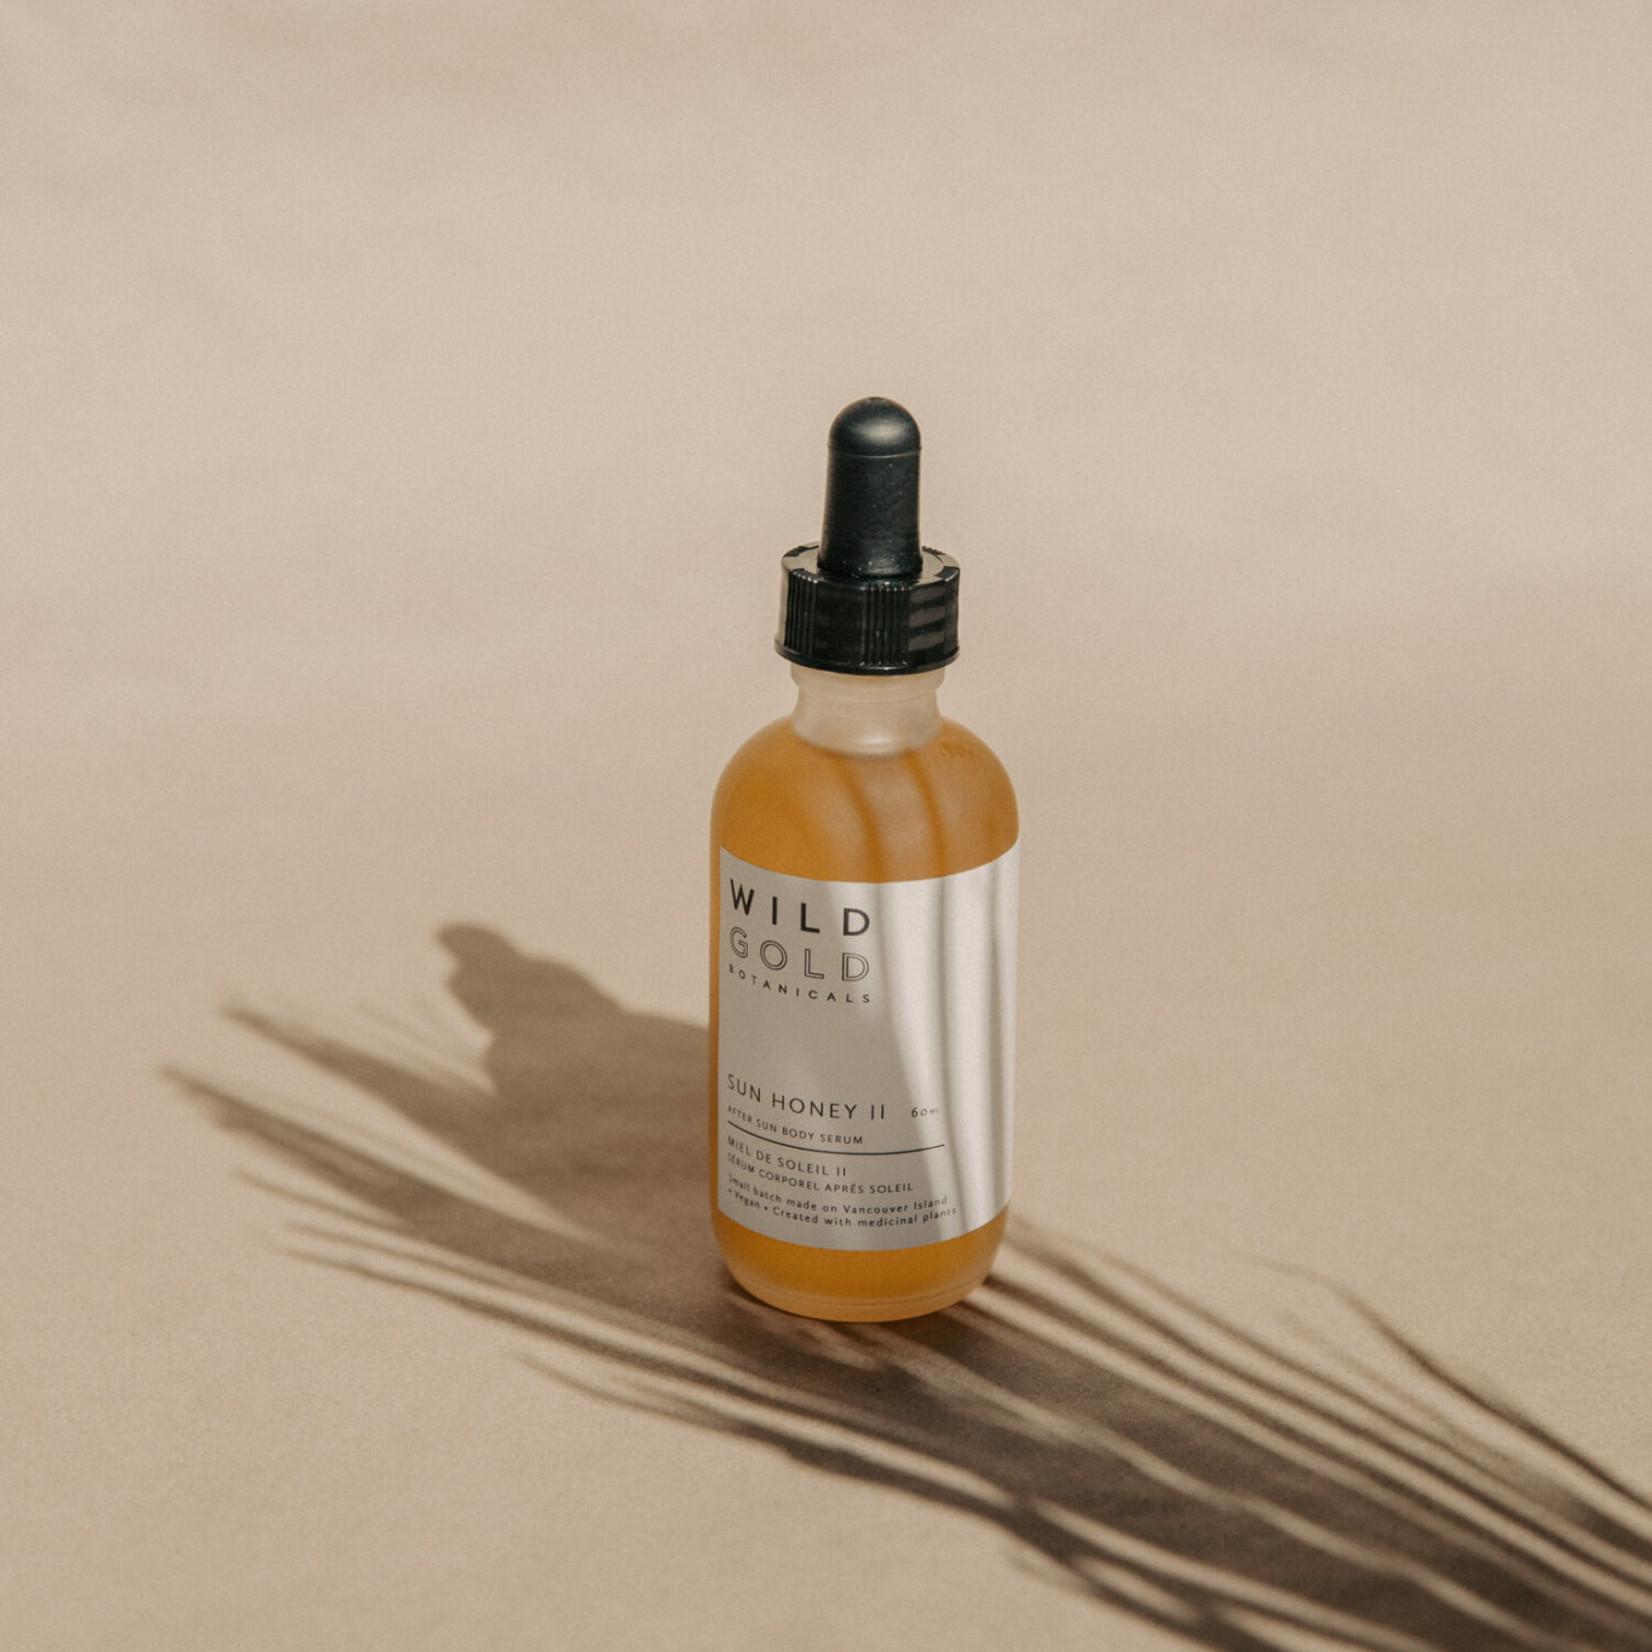 Wildgold botanicals Sun honey II